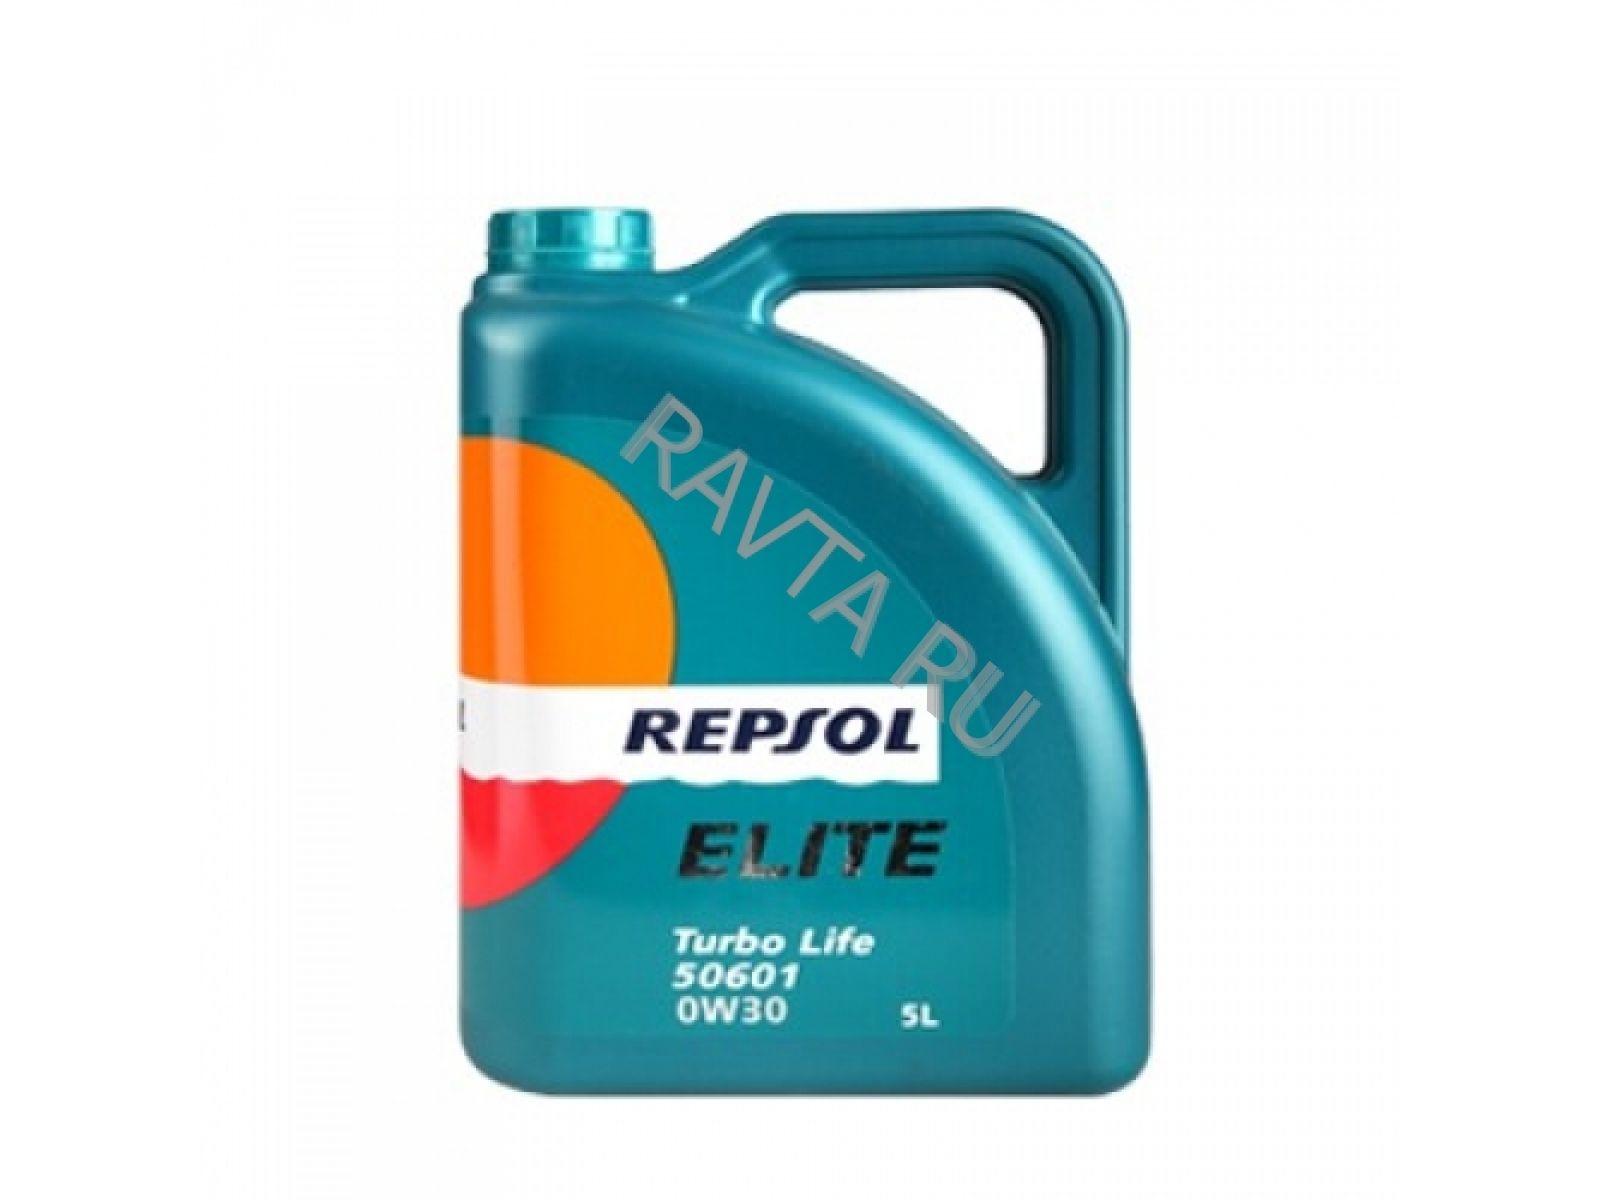 Масло Repsol Elite Turbo Life 50601 0W-30 (5л) от Ravta